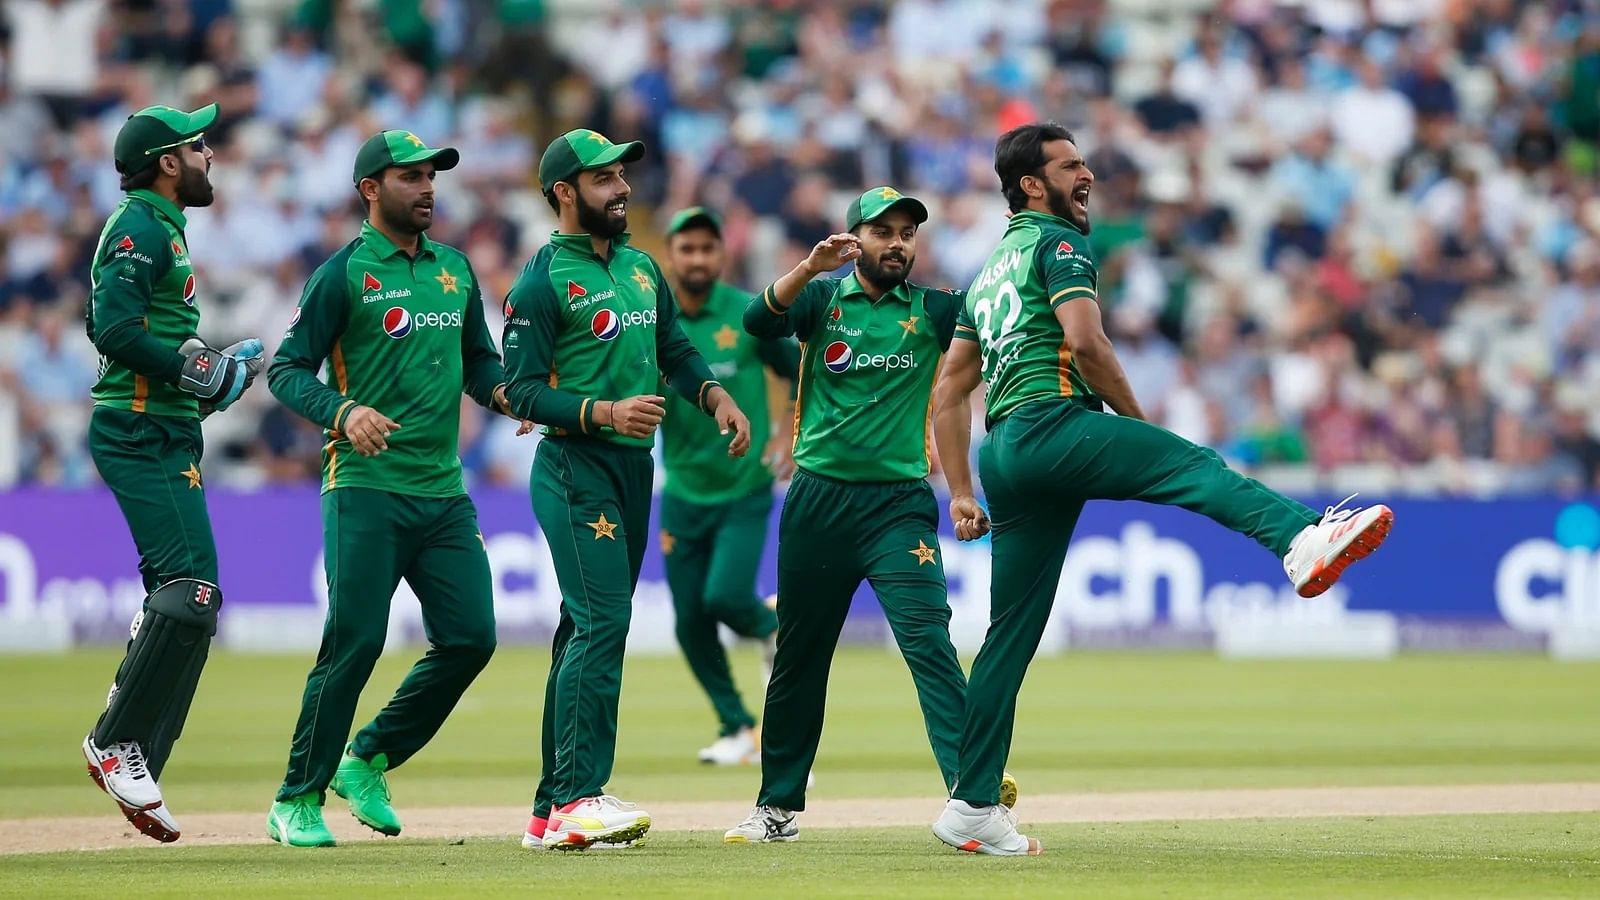 ICC T20 World Cup 2021: India Squad And Schedule, All Team Squad, Venue - বিশ্বকাপের জন্য ঘোষণা হলো সকল টিমের খেলোয়াড় তালিকা, দেখে নিন এক নজরে 6